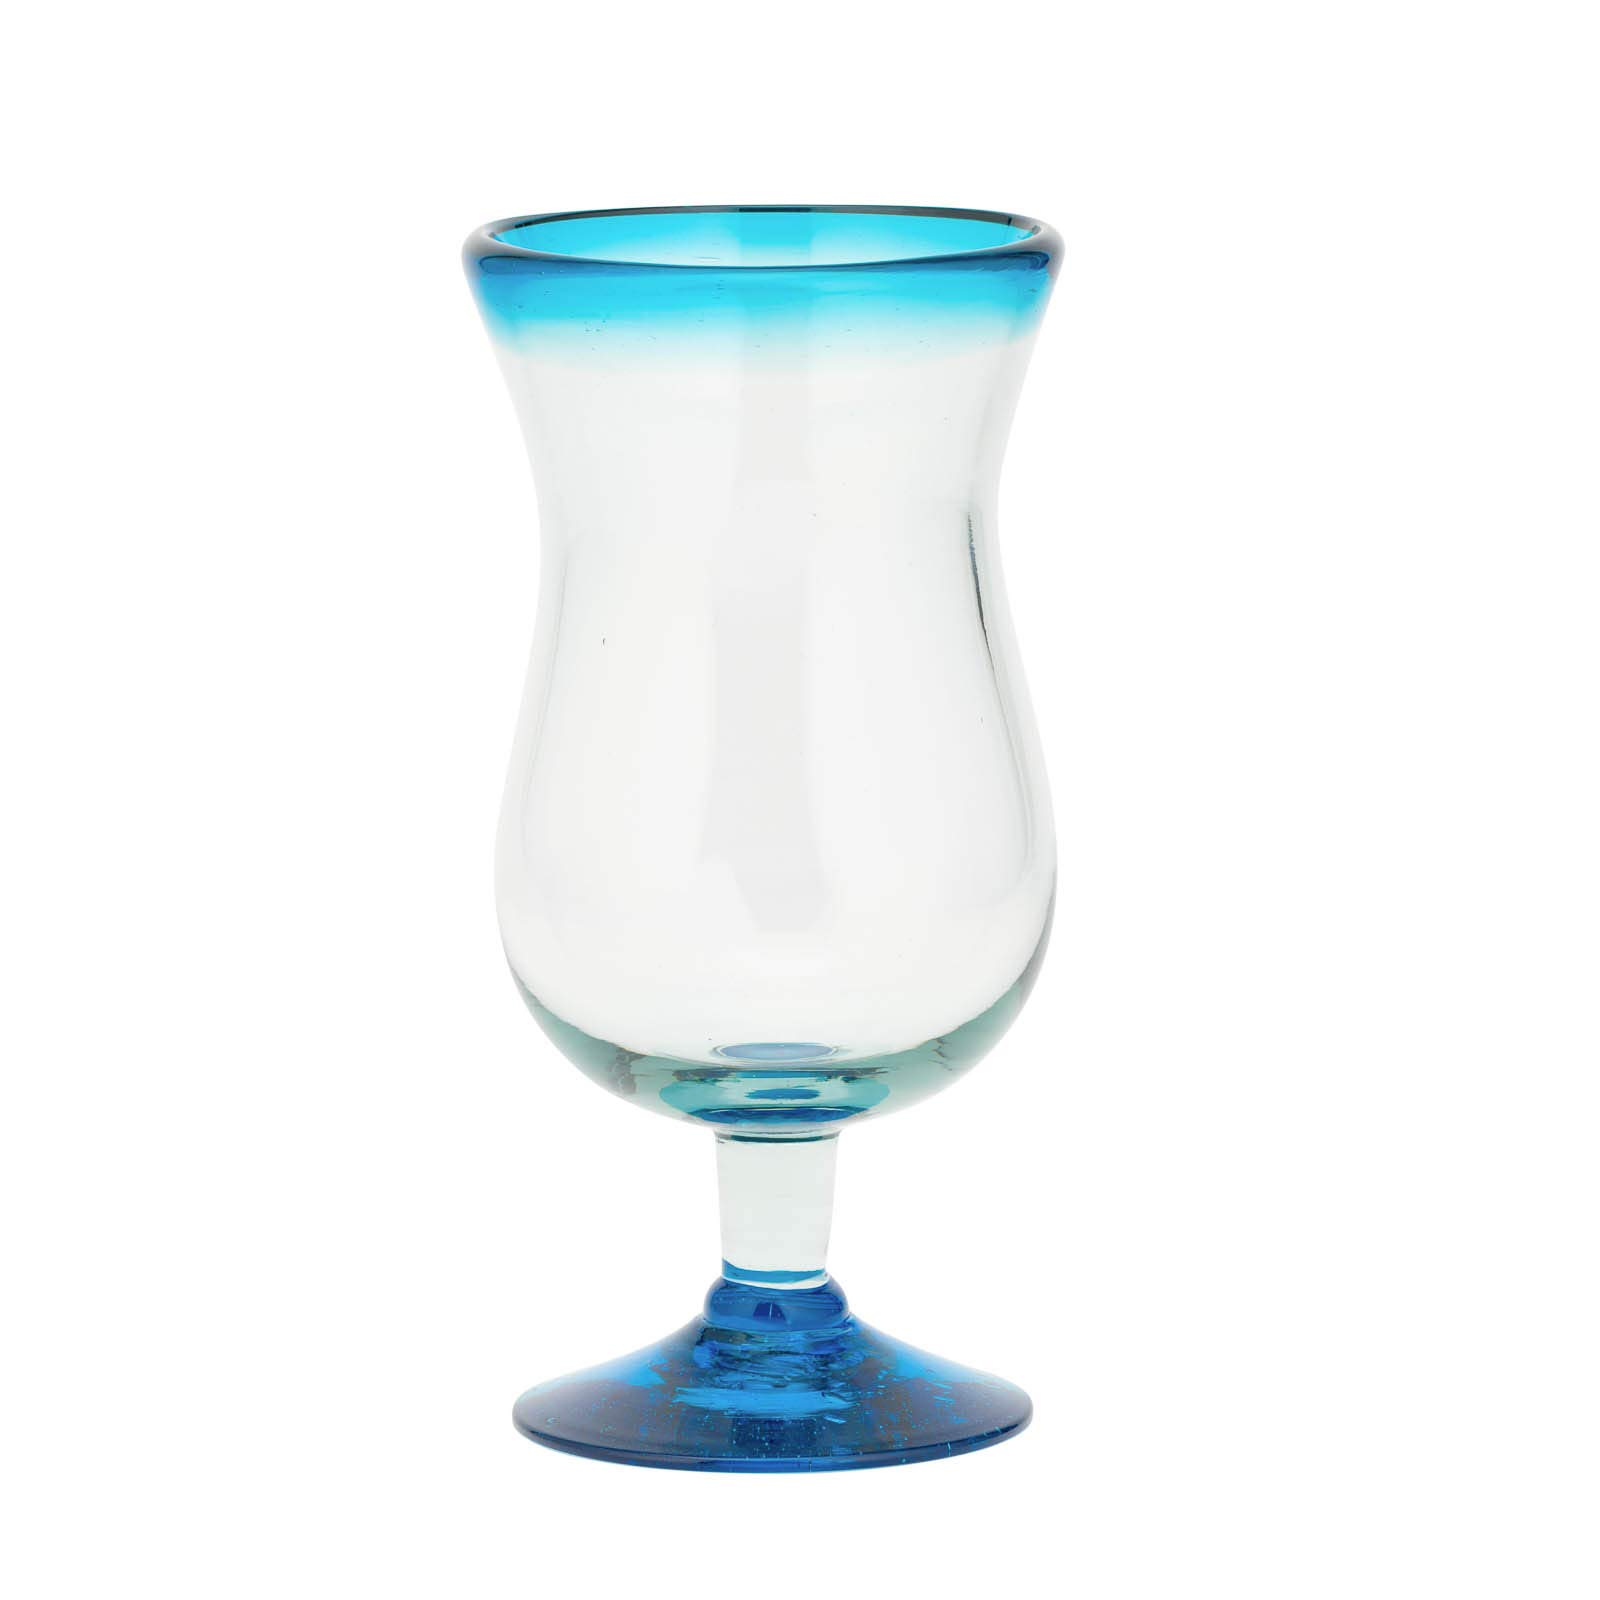 Amici Home 7MCR379S4R Baja Hurricane Drinking Glass 16 Fluid Ounces Aqua Rim by Amici Home